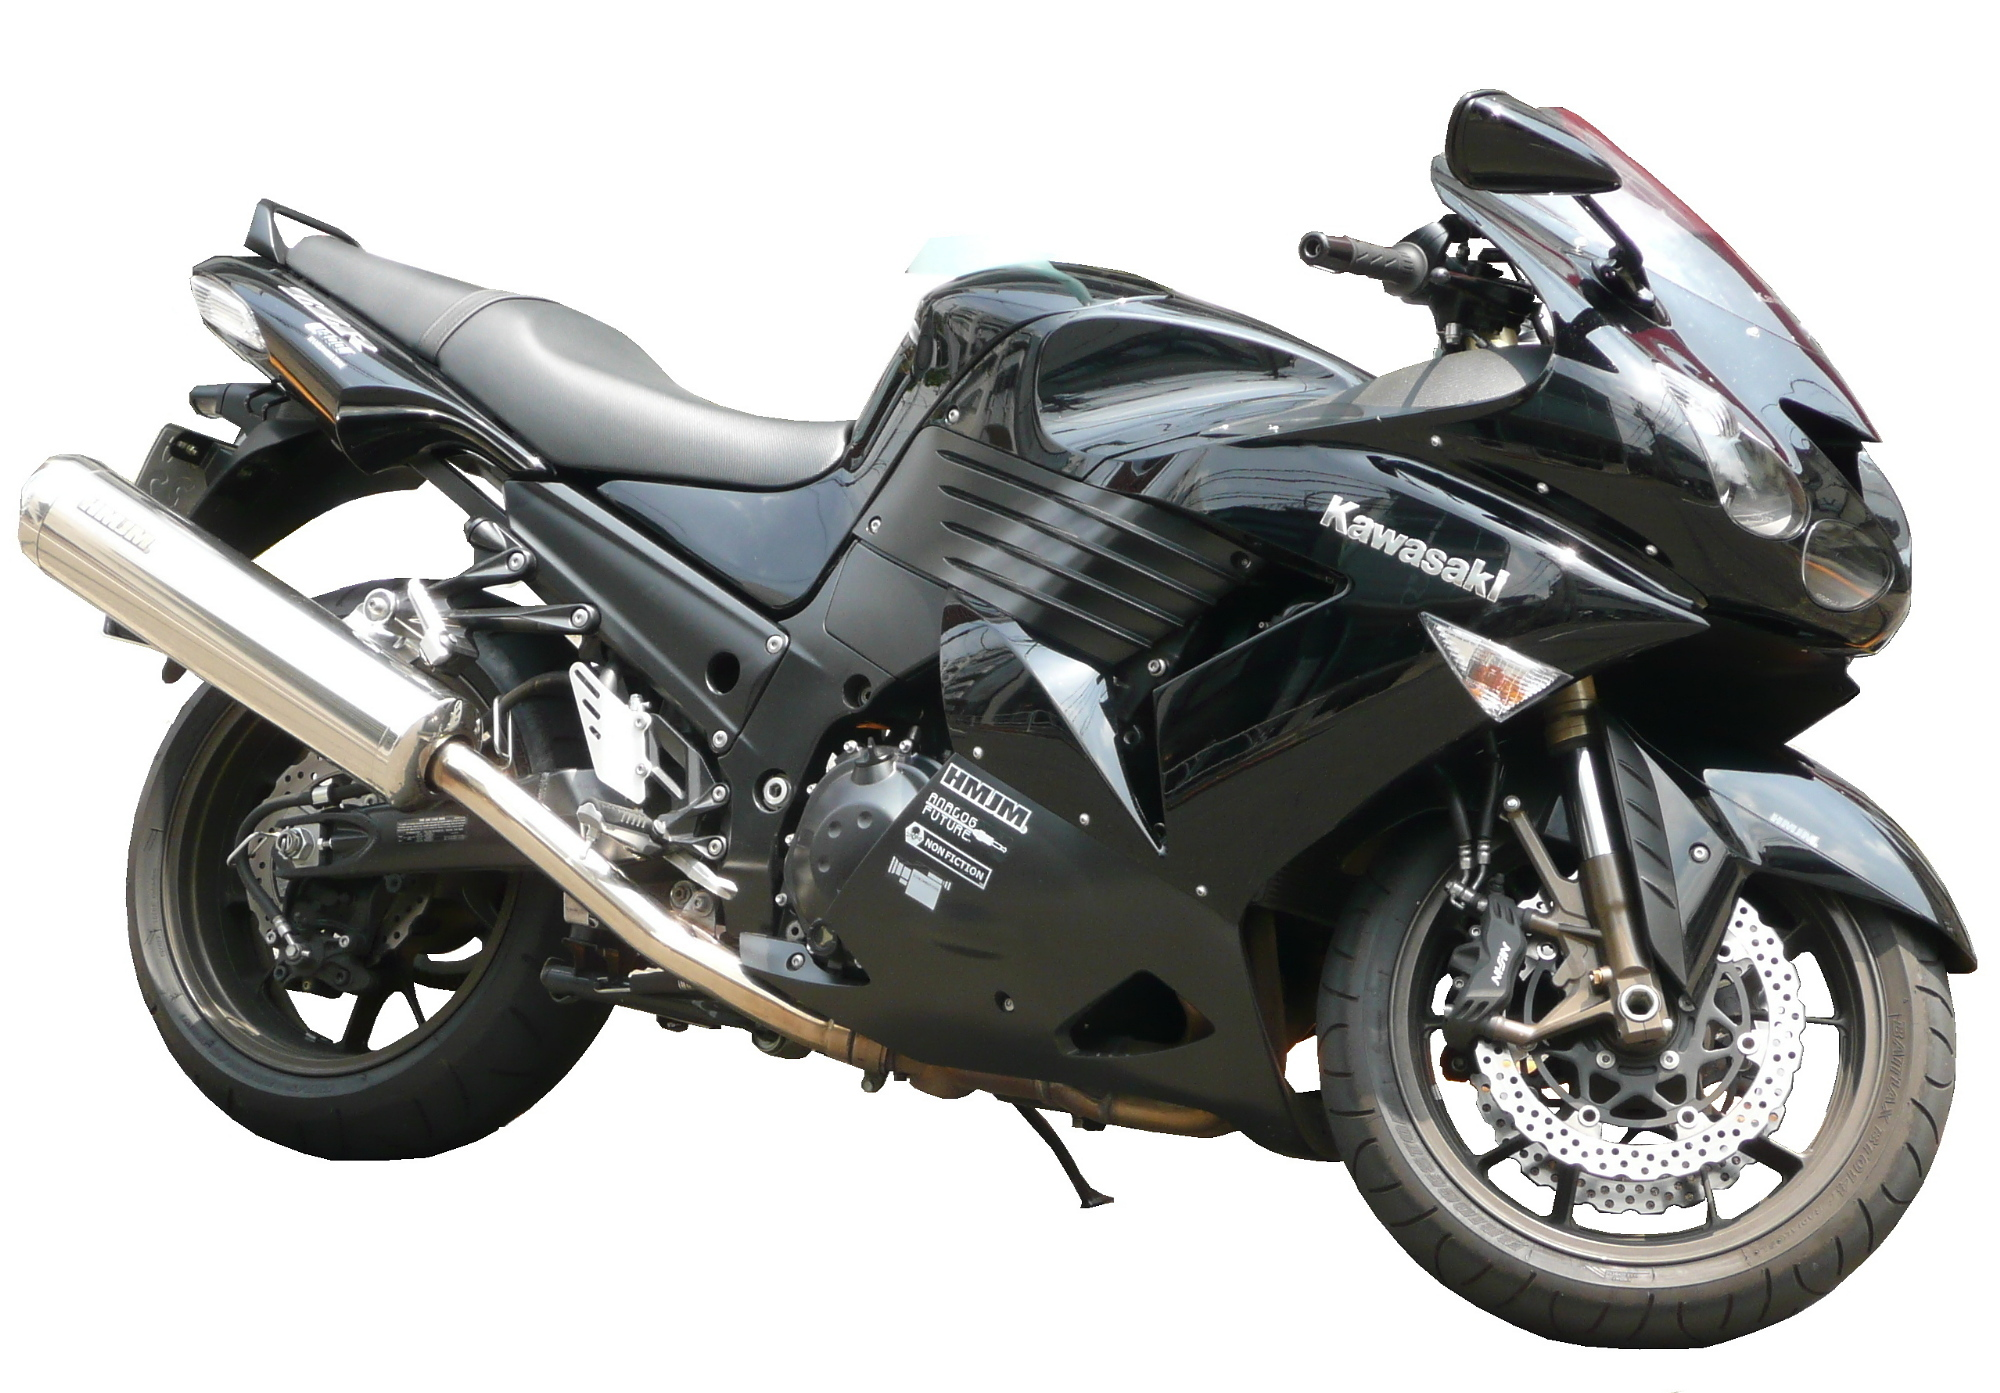 File:Kawasaki ZZR1400 2006.jpg - Wikimedia Commons